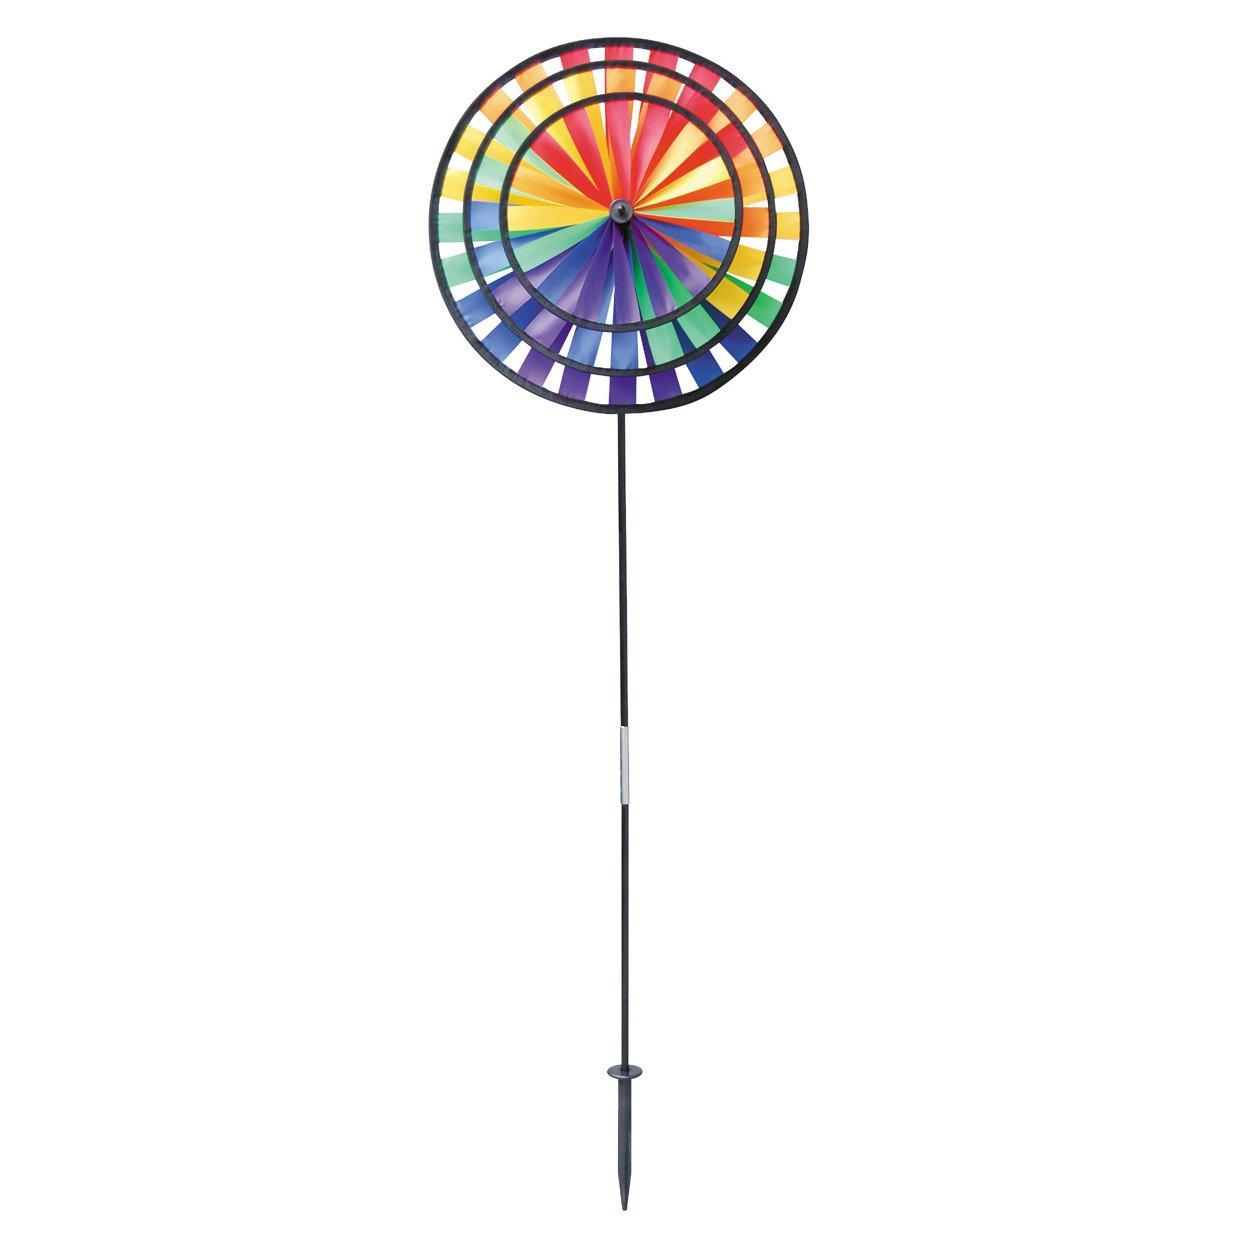 Gardener's Select A144 Pin Wheel, 7 by 14'', Multicolor